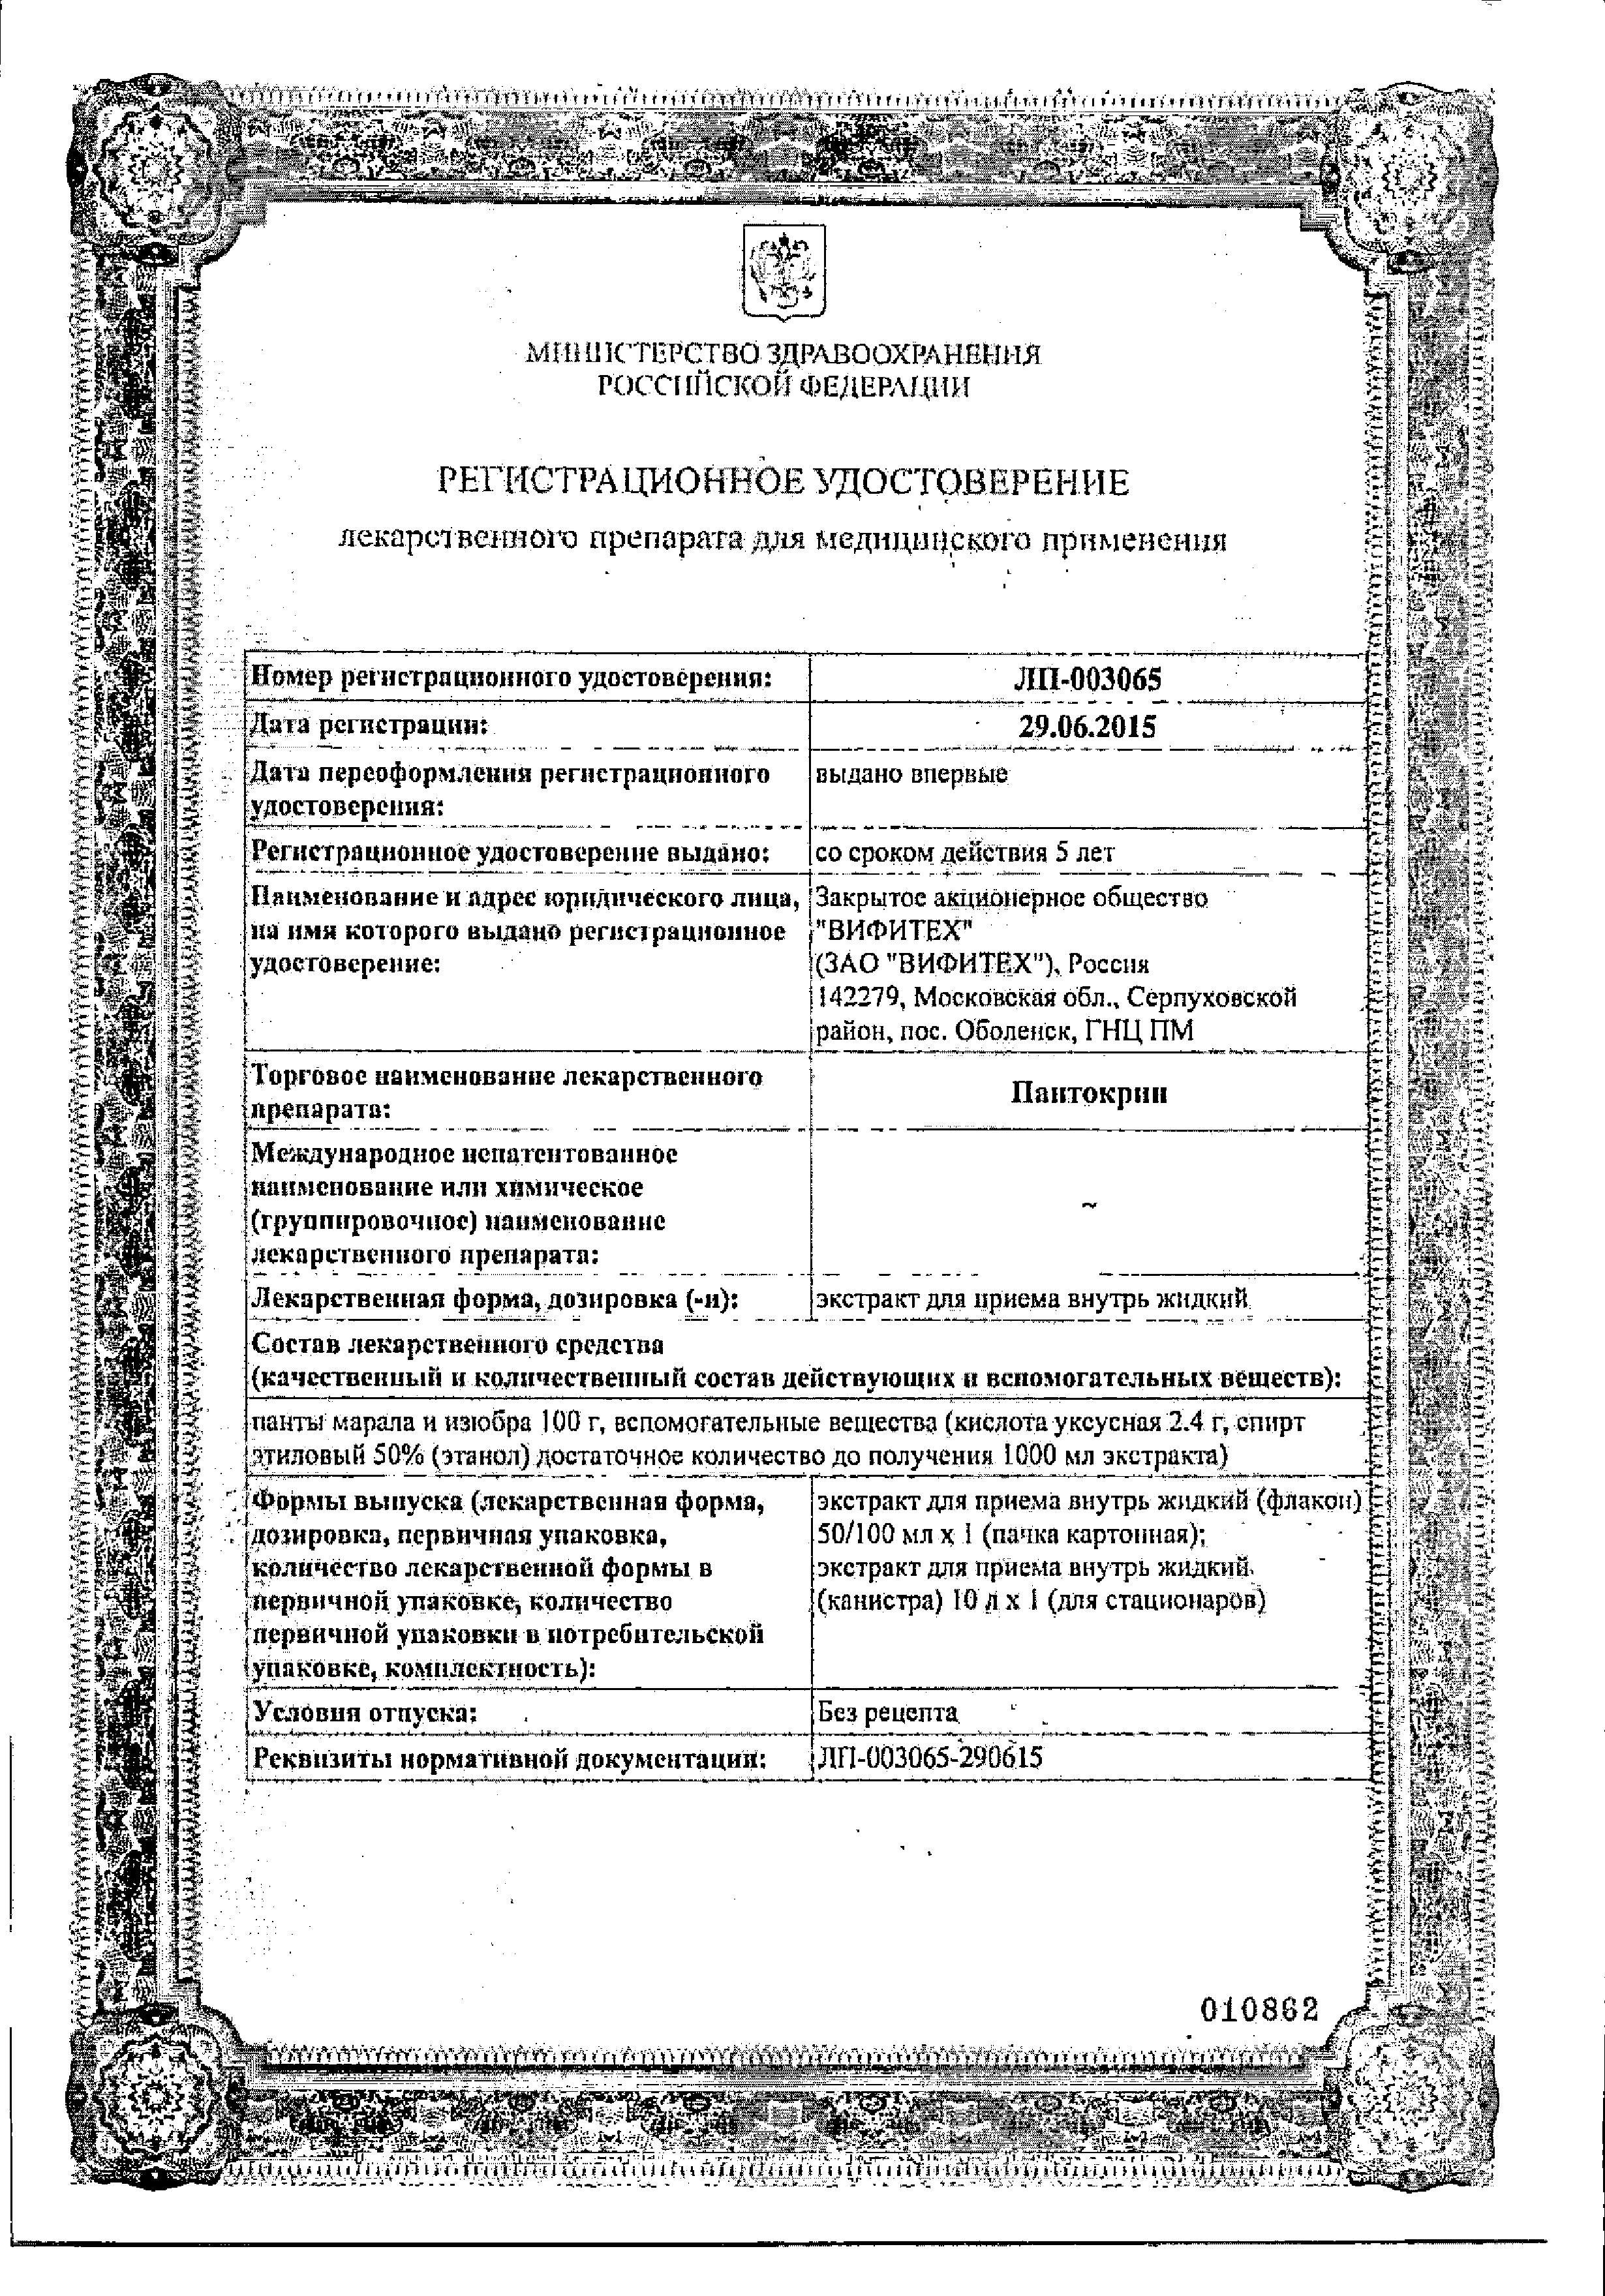 Пантокрин сертификат